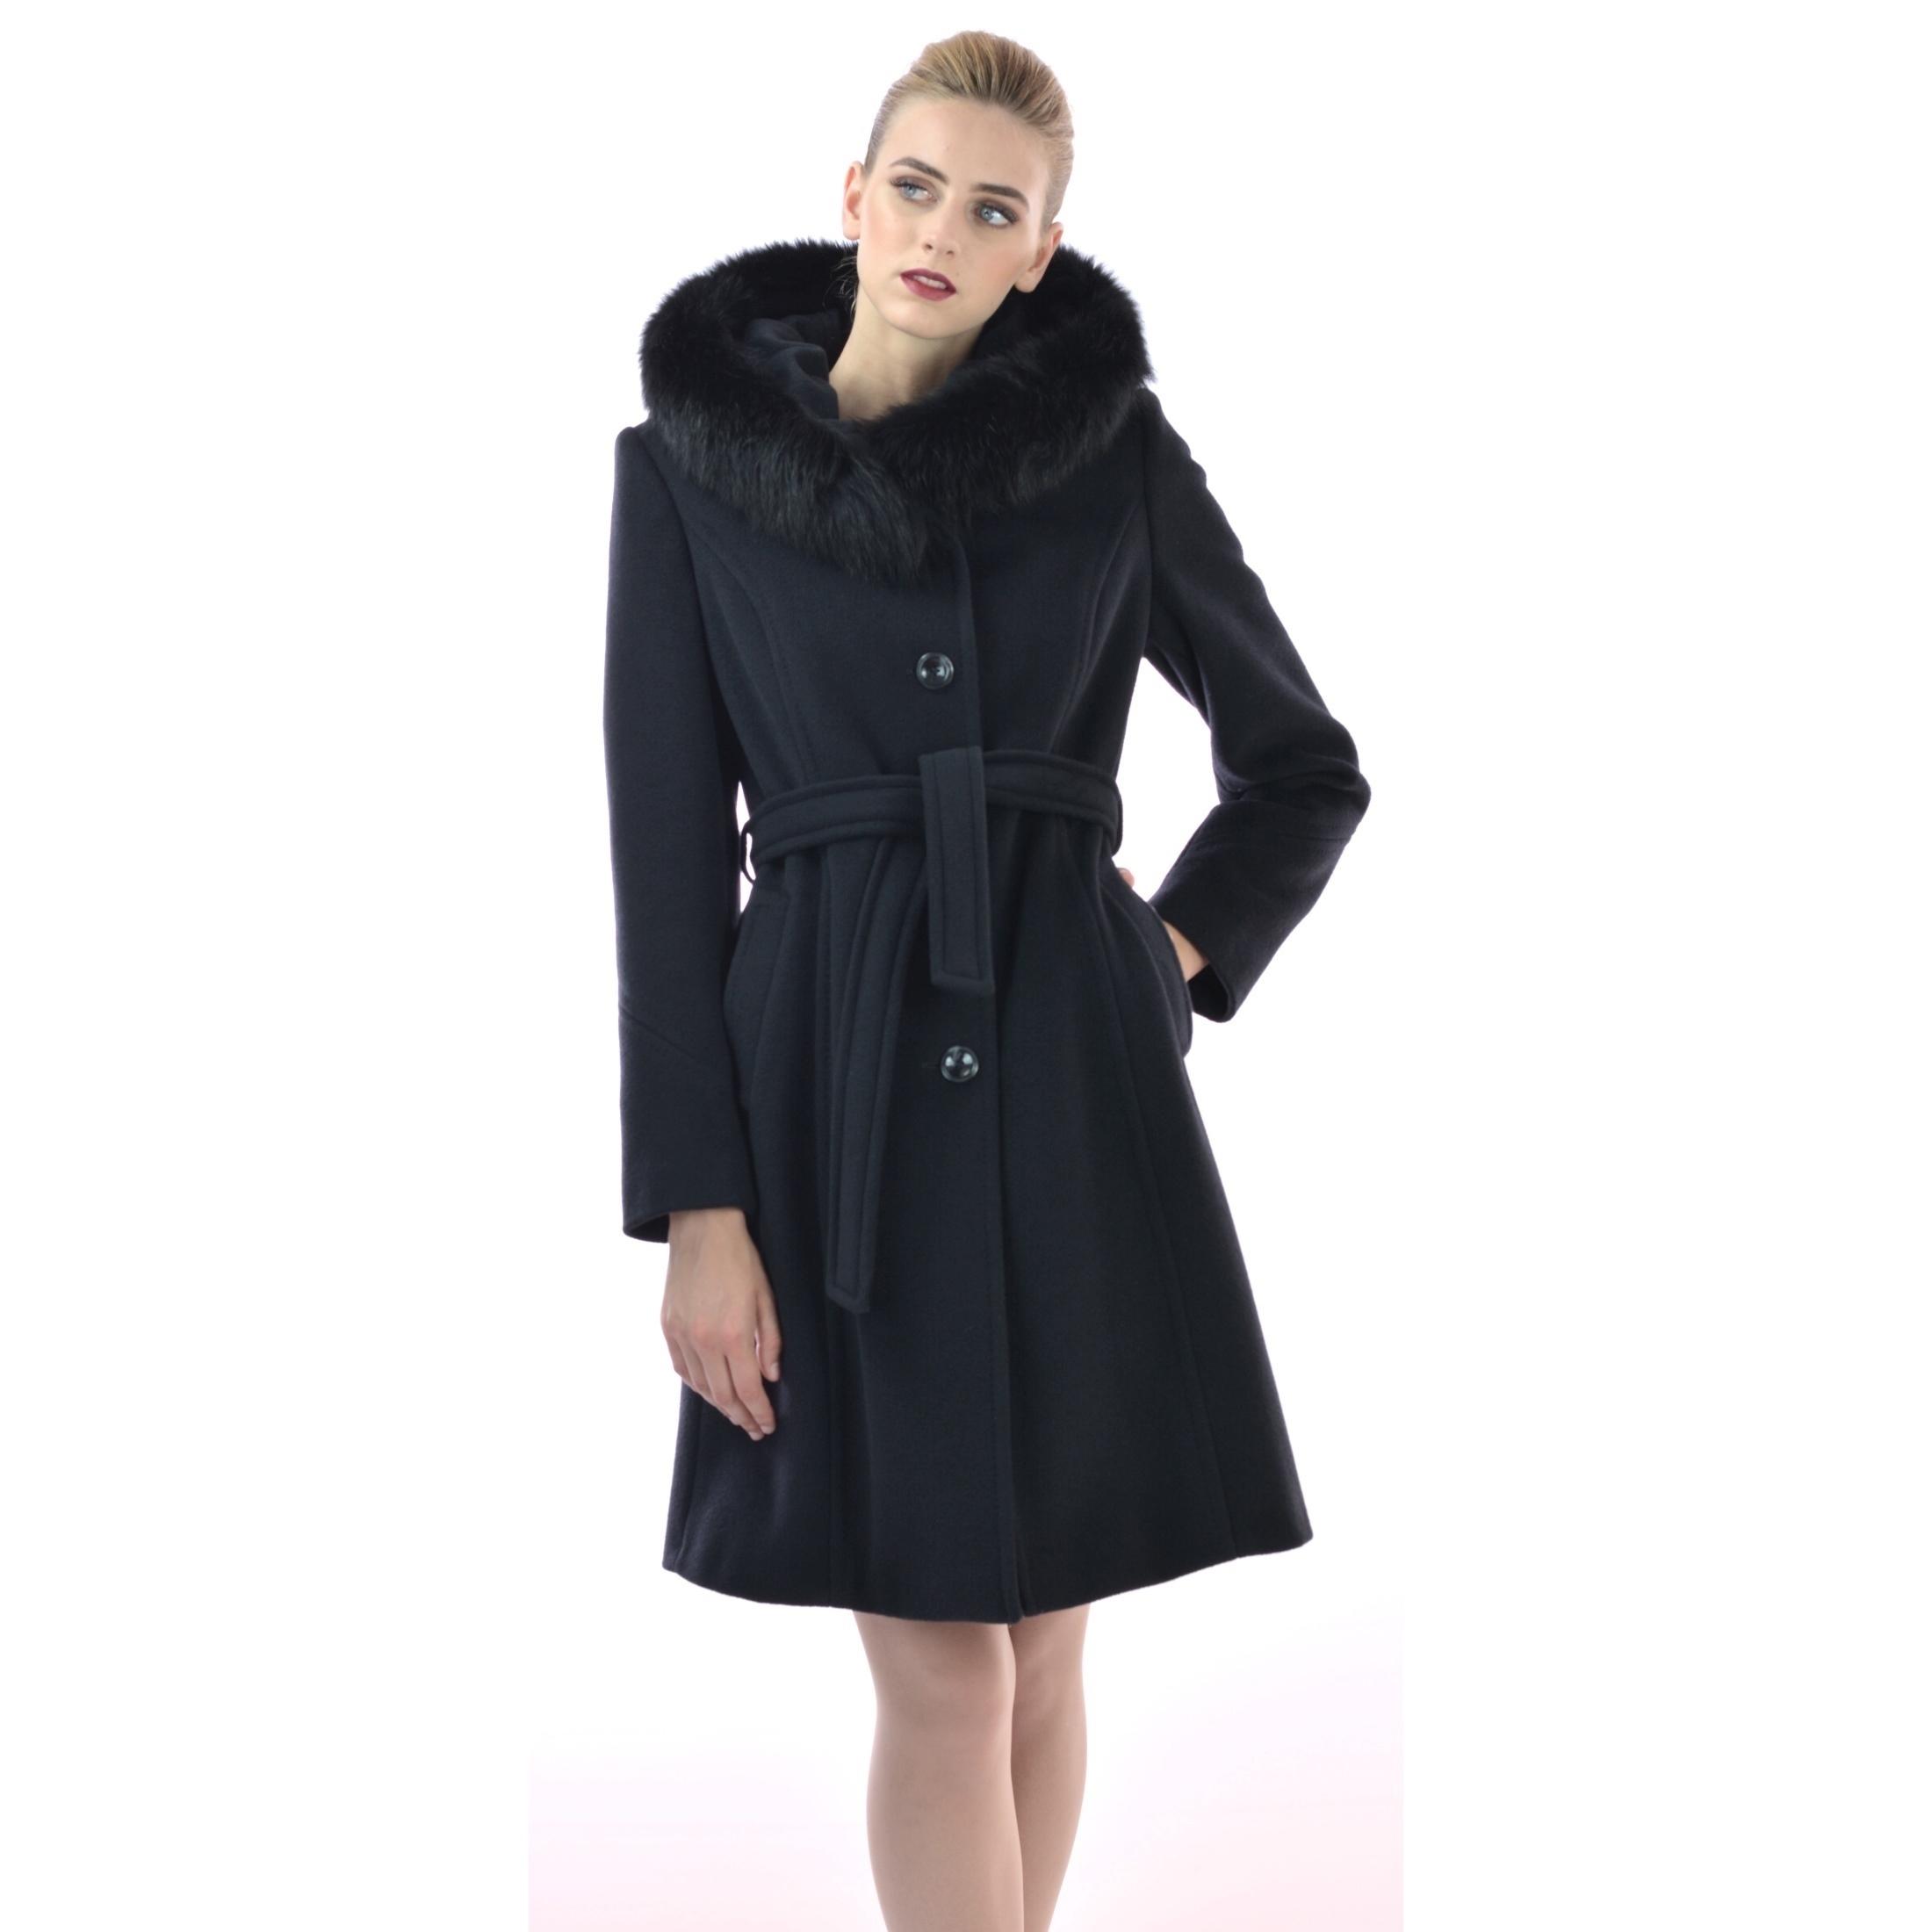 ženski kaput,ženska odjeća,women's coat,women's clothing